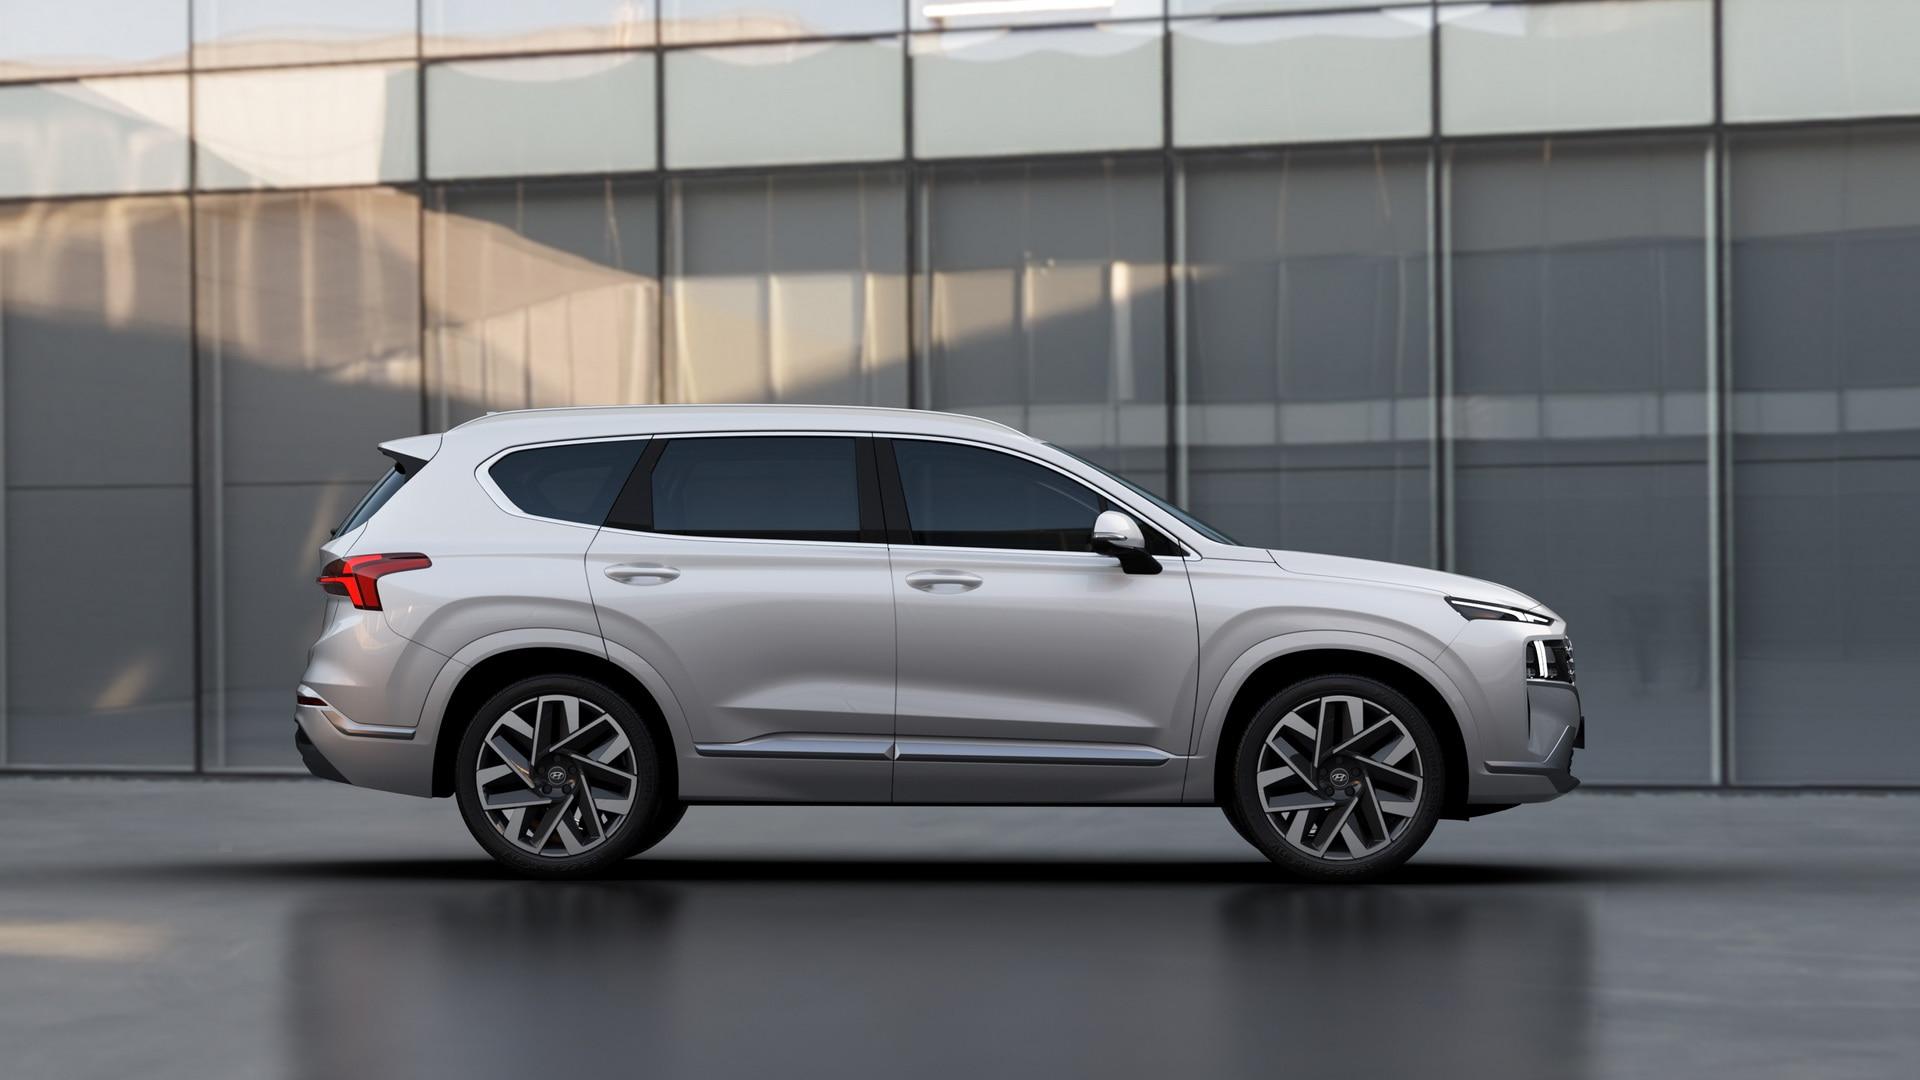 Hyundai Santa Fe 2021 Tem Novo Visual E Motorizacao Hibrida